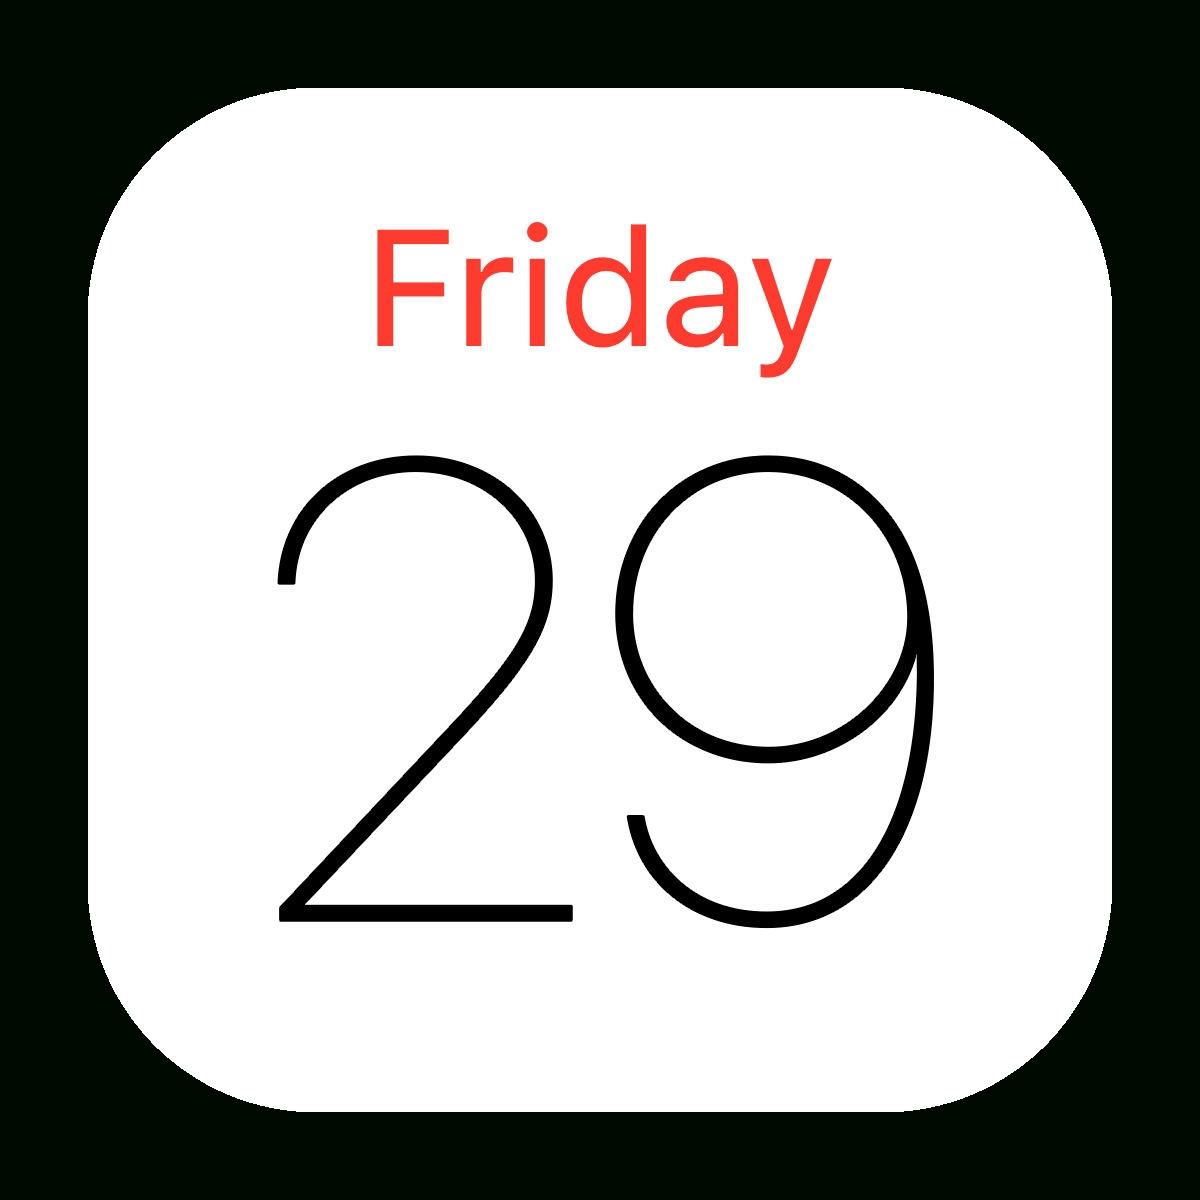 Iphone Calendar Apps Logo - Logodix_I Lost Calendar Icon On Iphone